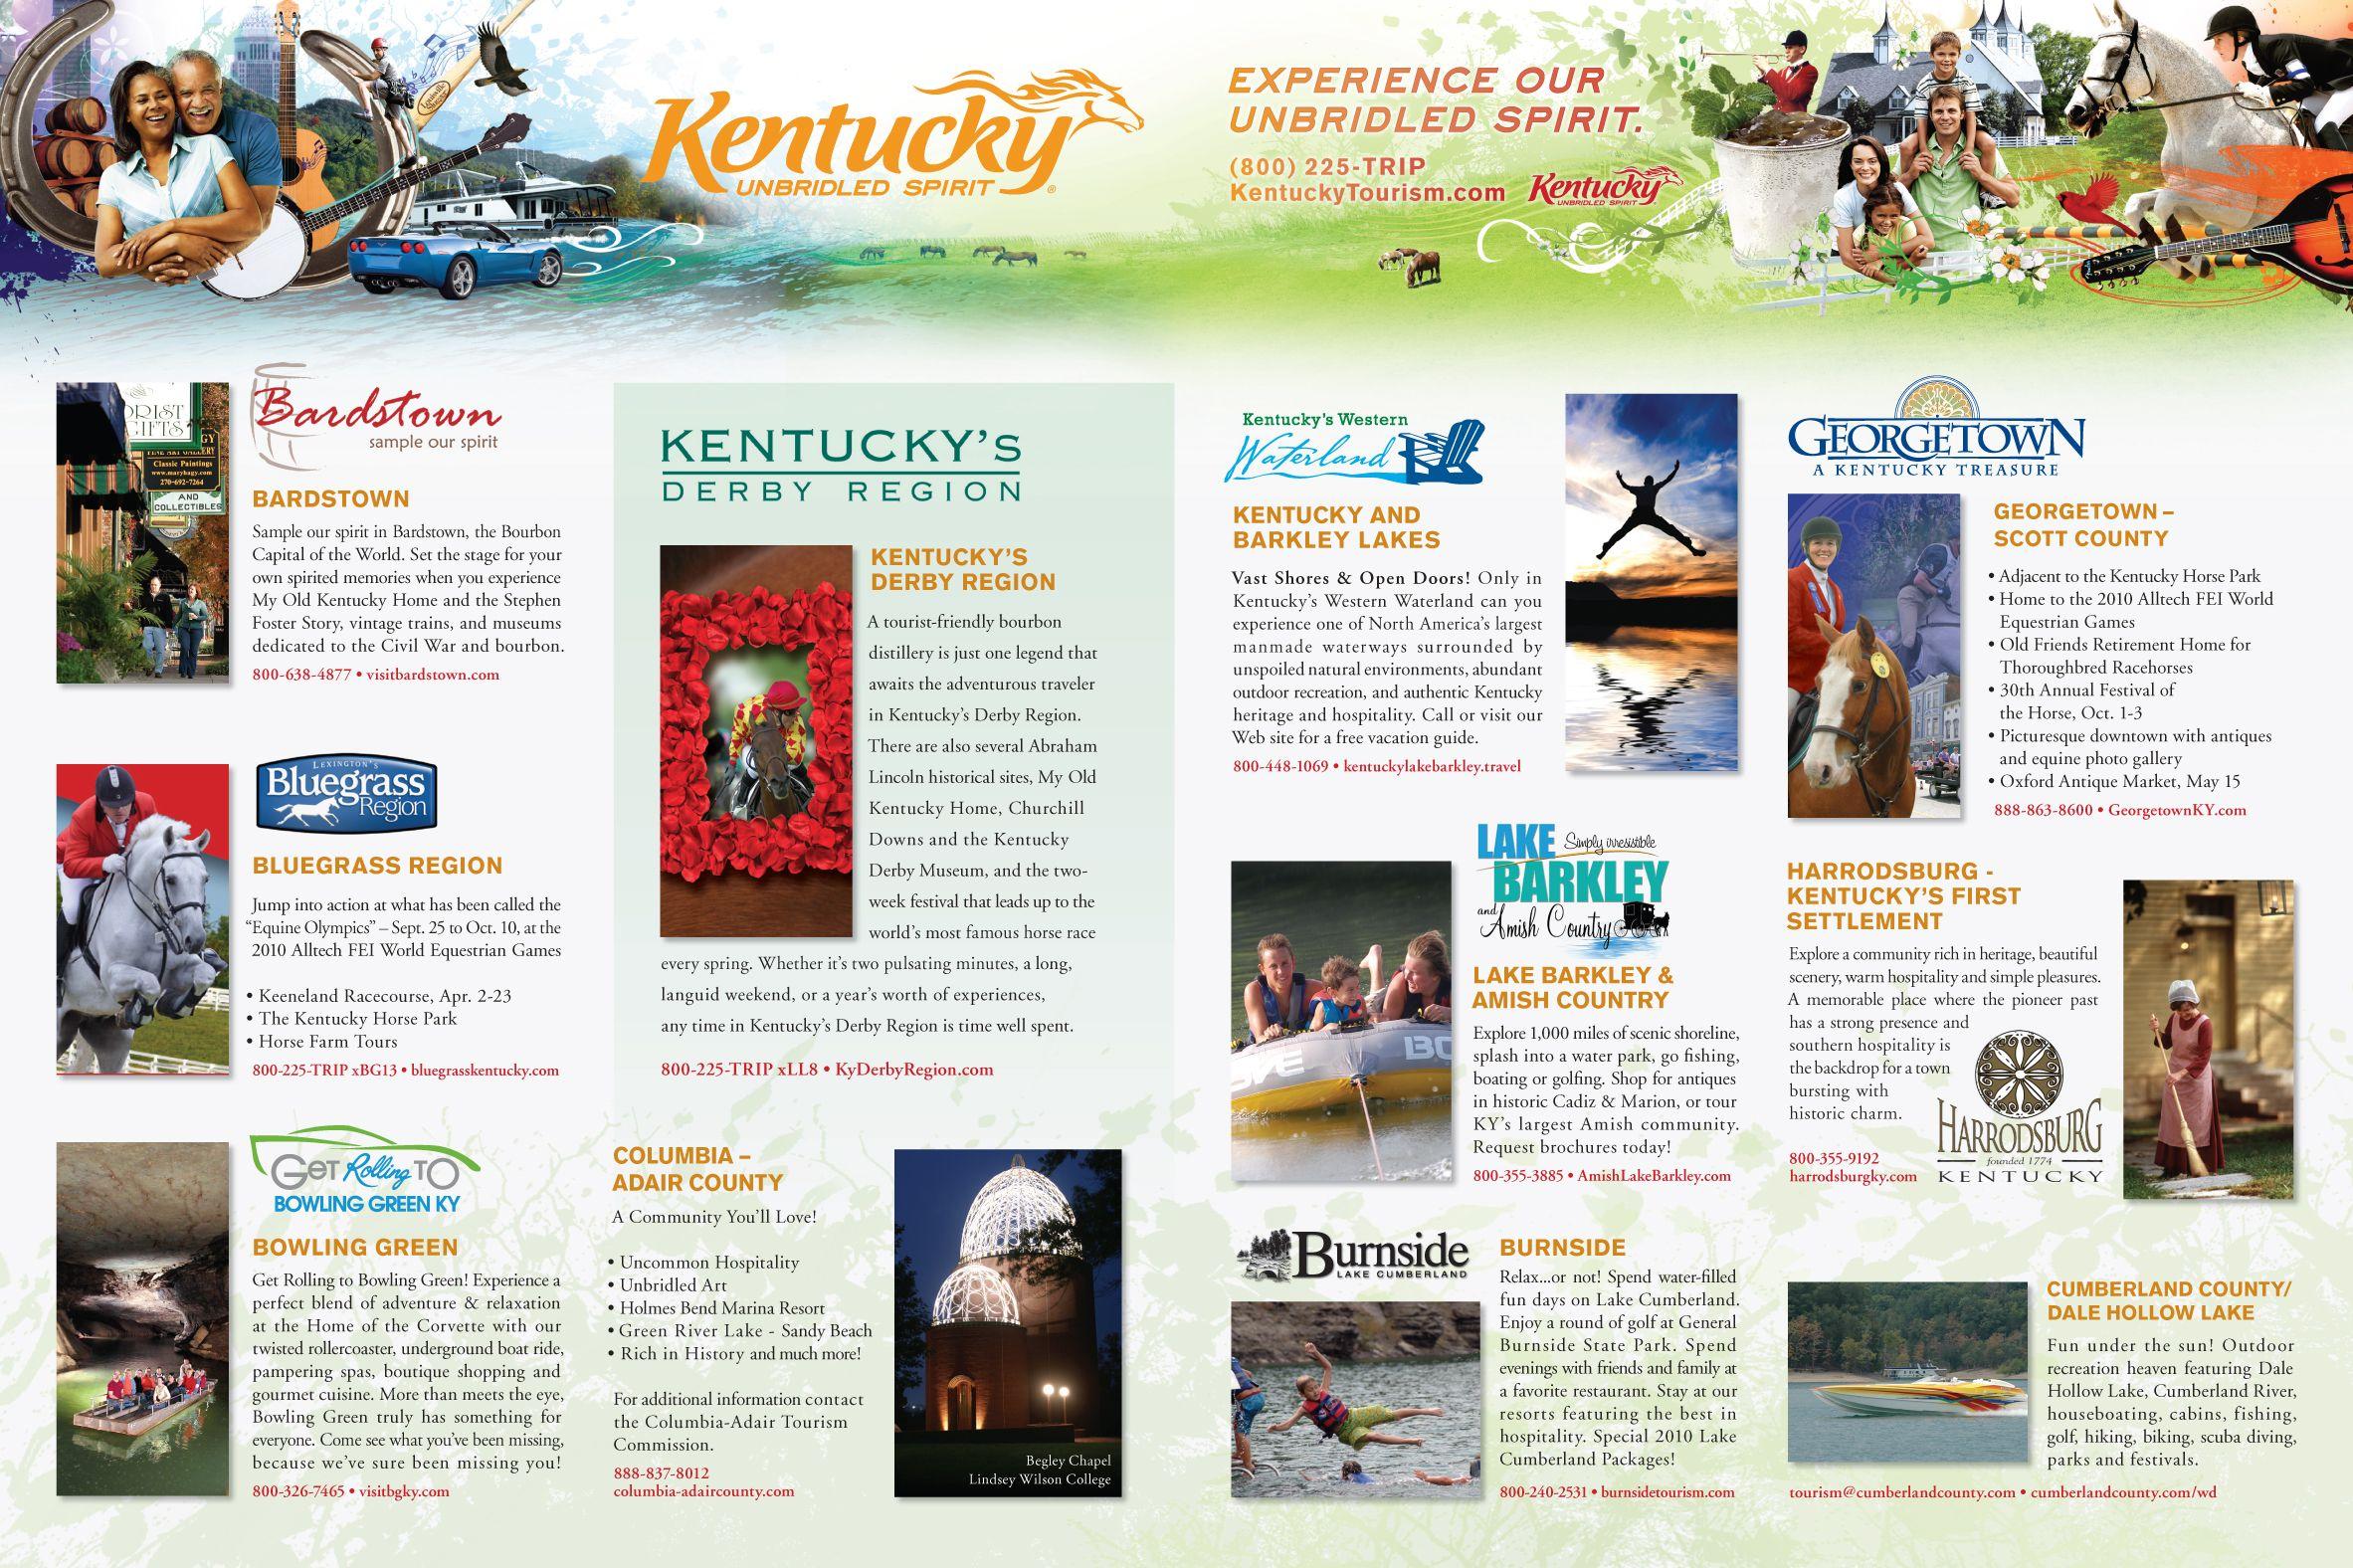 Kentucky Tourism Spread! #KY